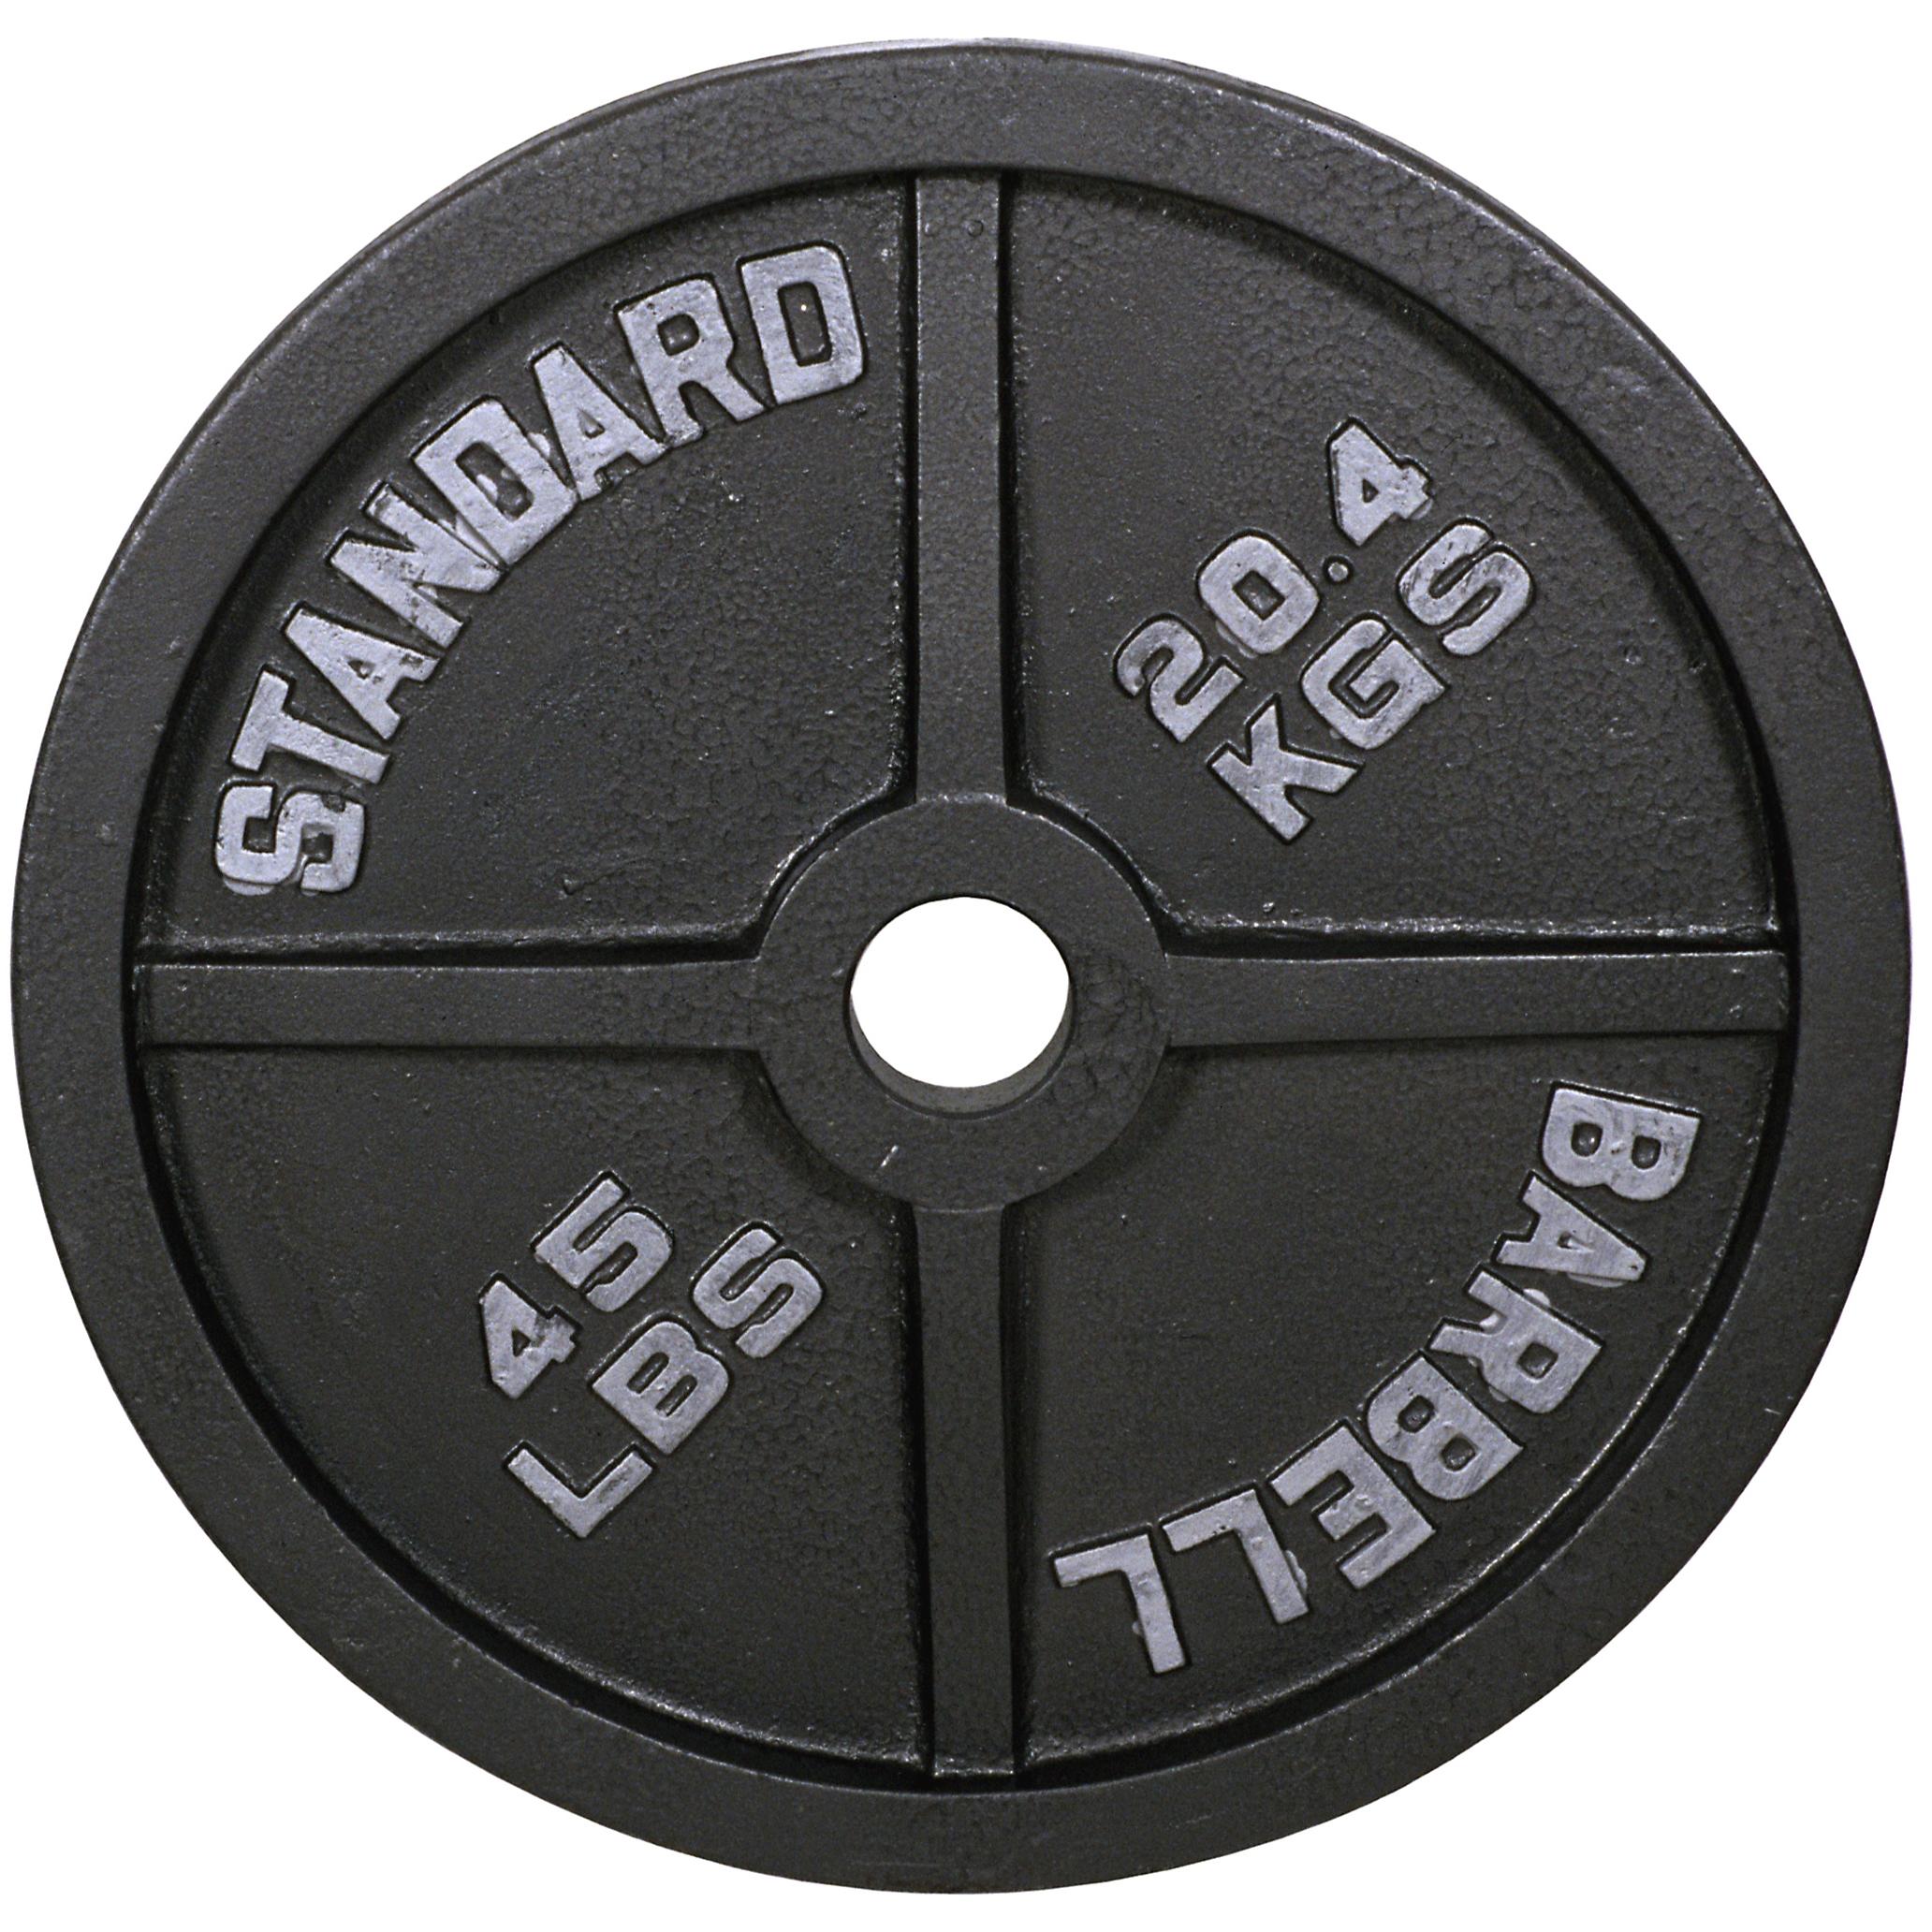 Strength Training -